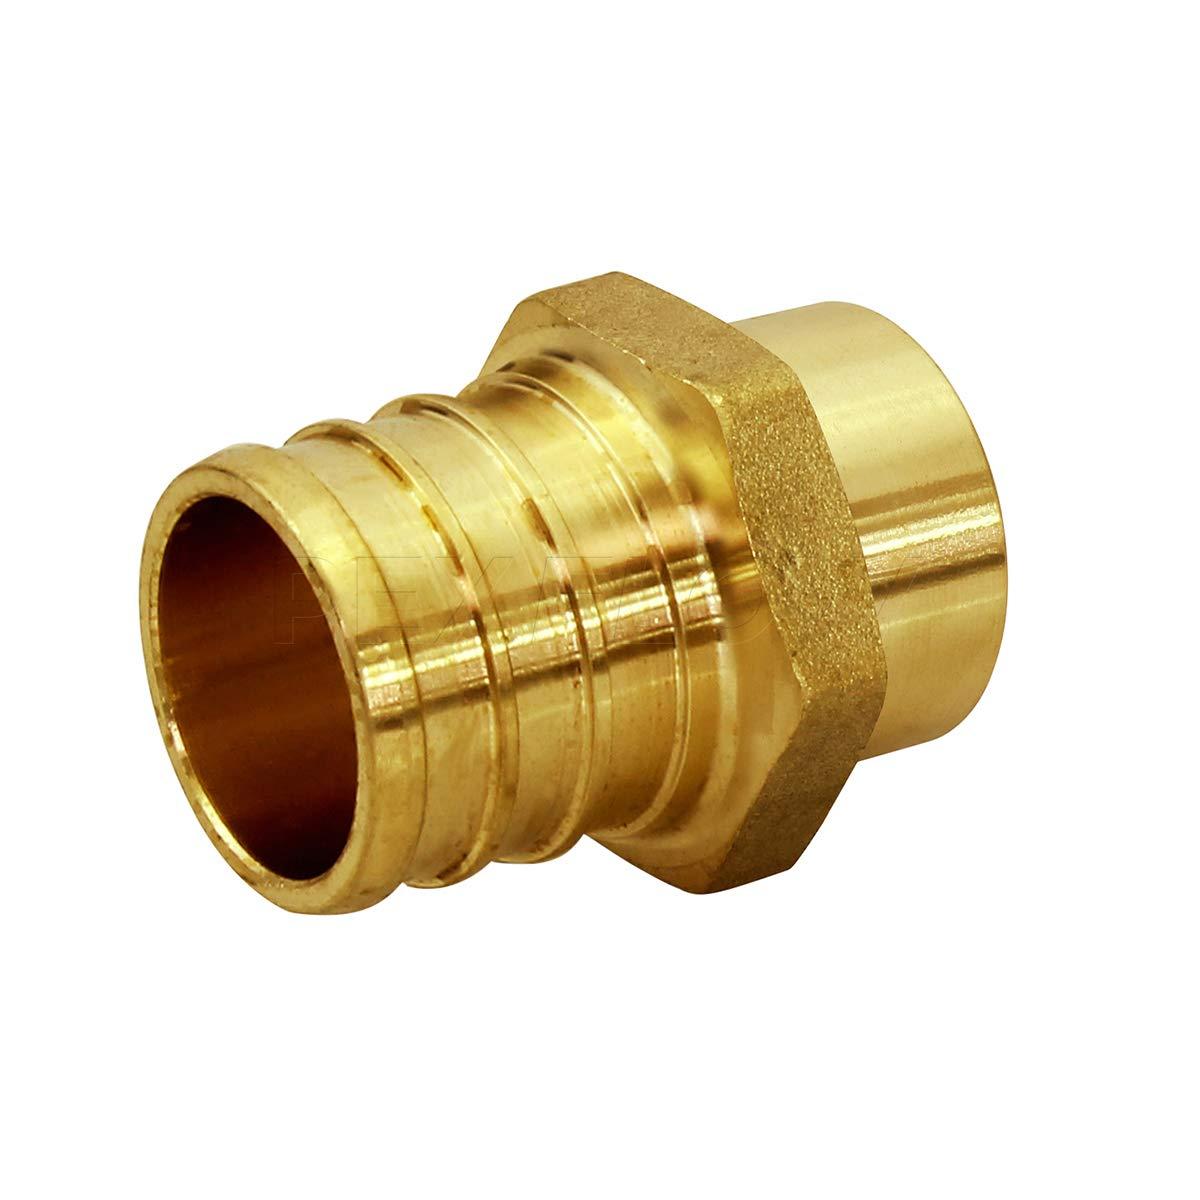 Pexflow PSMA1258-NL Male Sweat Adapter X Pex Barb Pipe Fitting 1/2'' X 5/8'' Brass